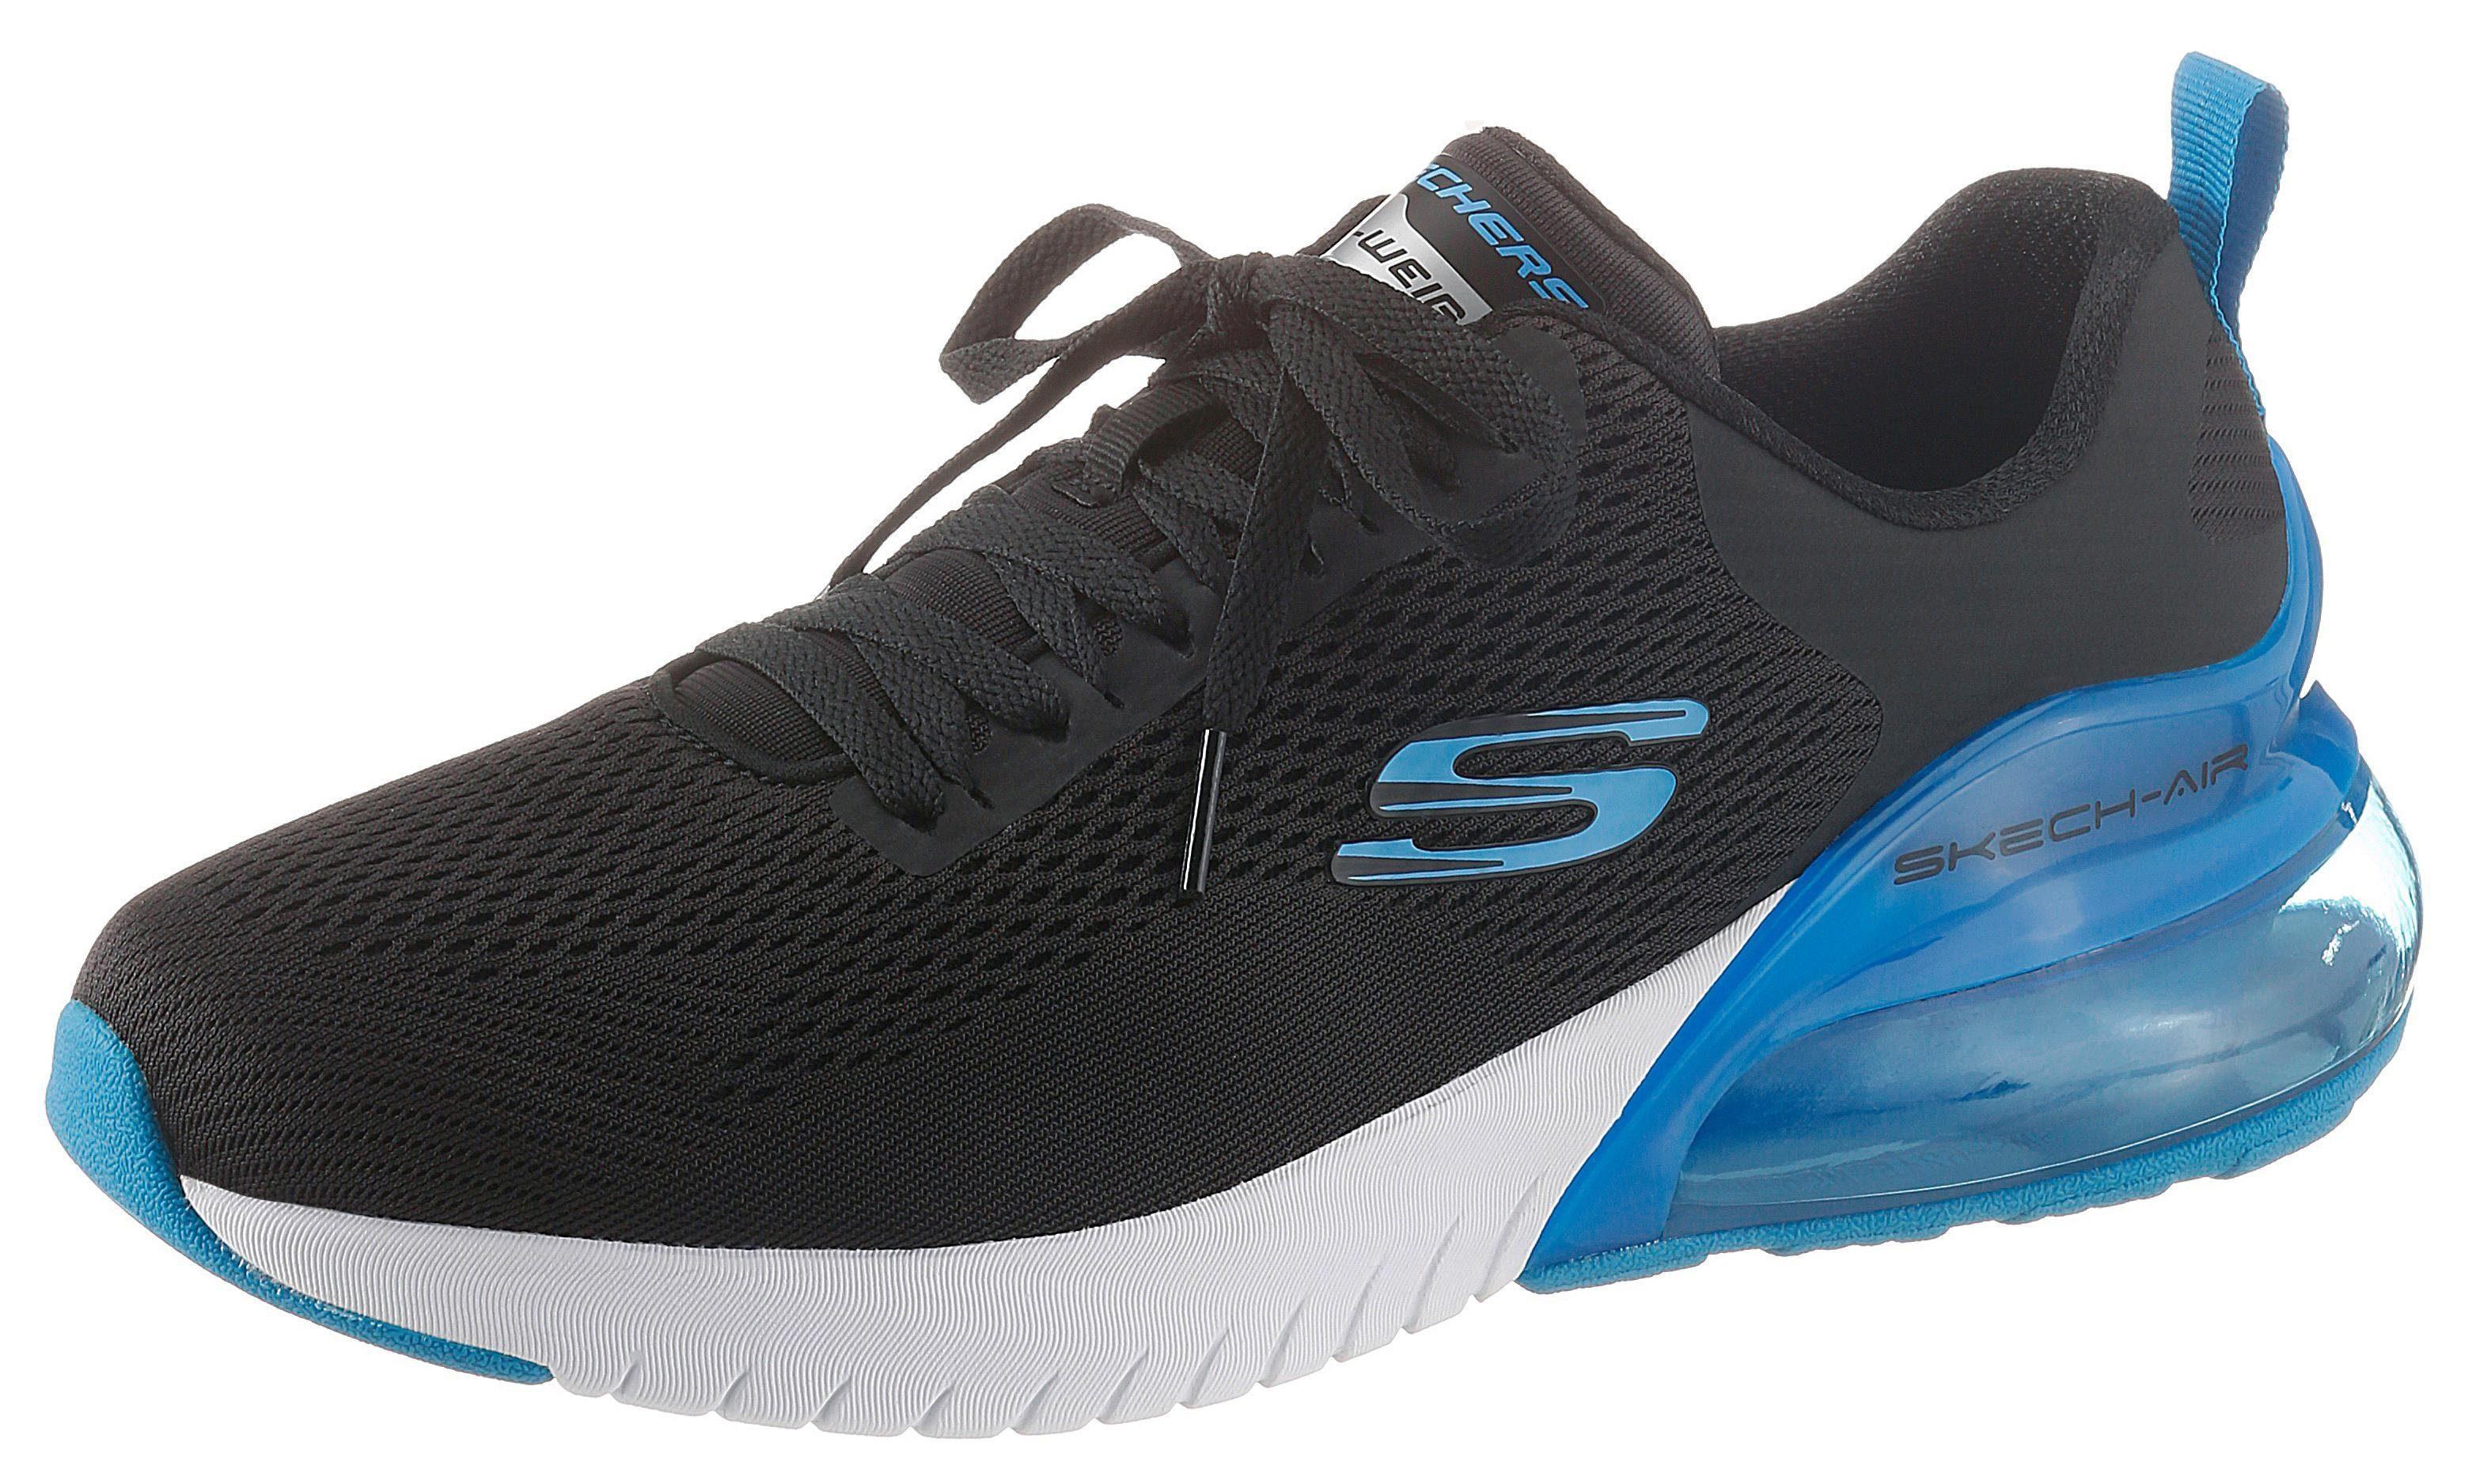 Skechers »Skech Air Stratus« Sneaker mit Air Cooled Memory Foam online kaufen | OTTO